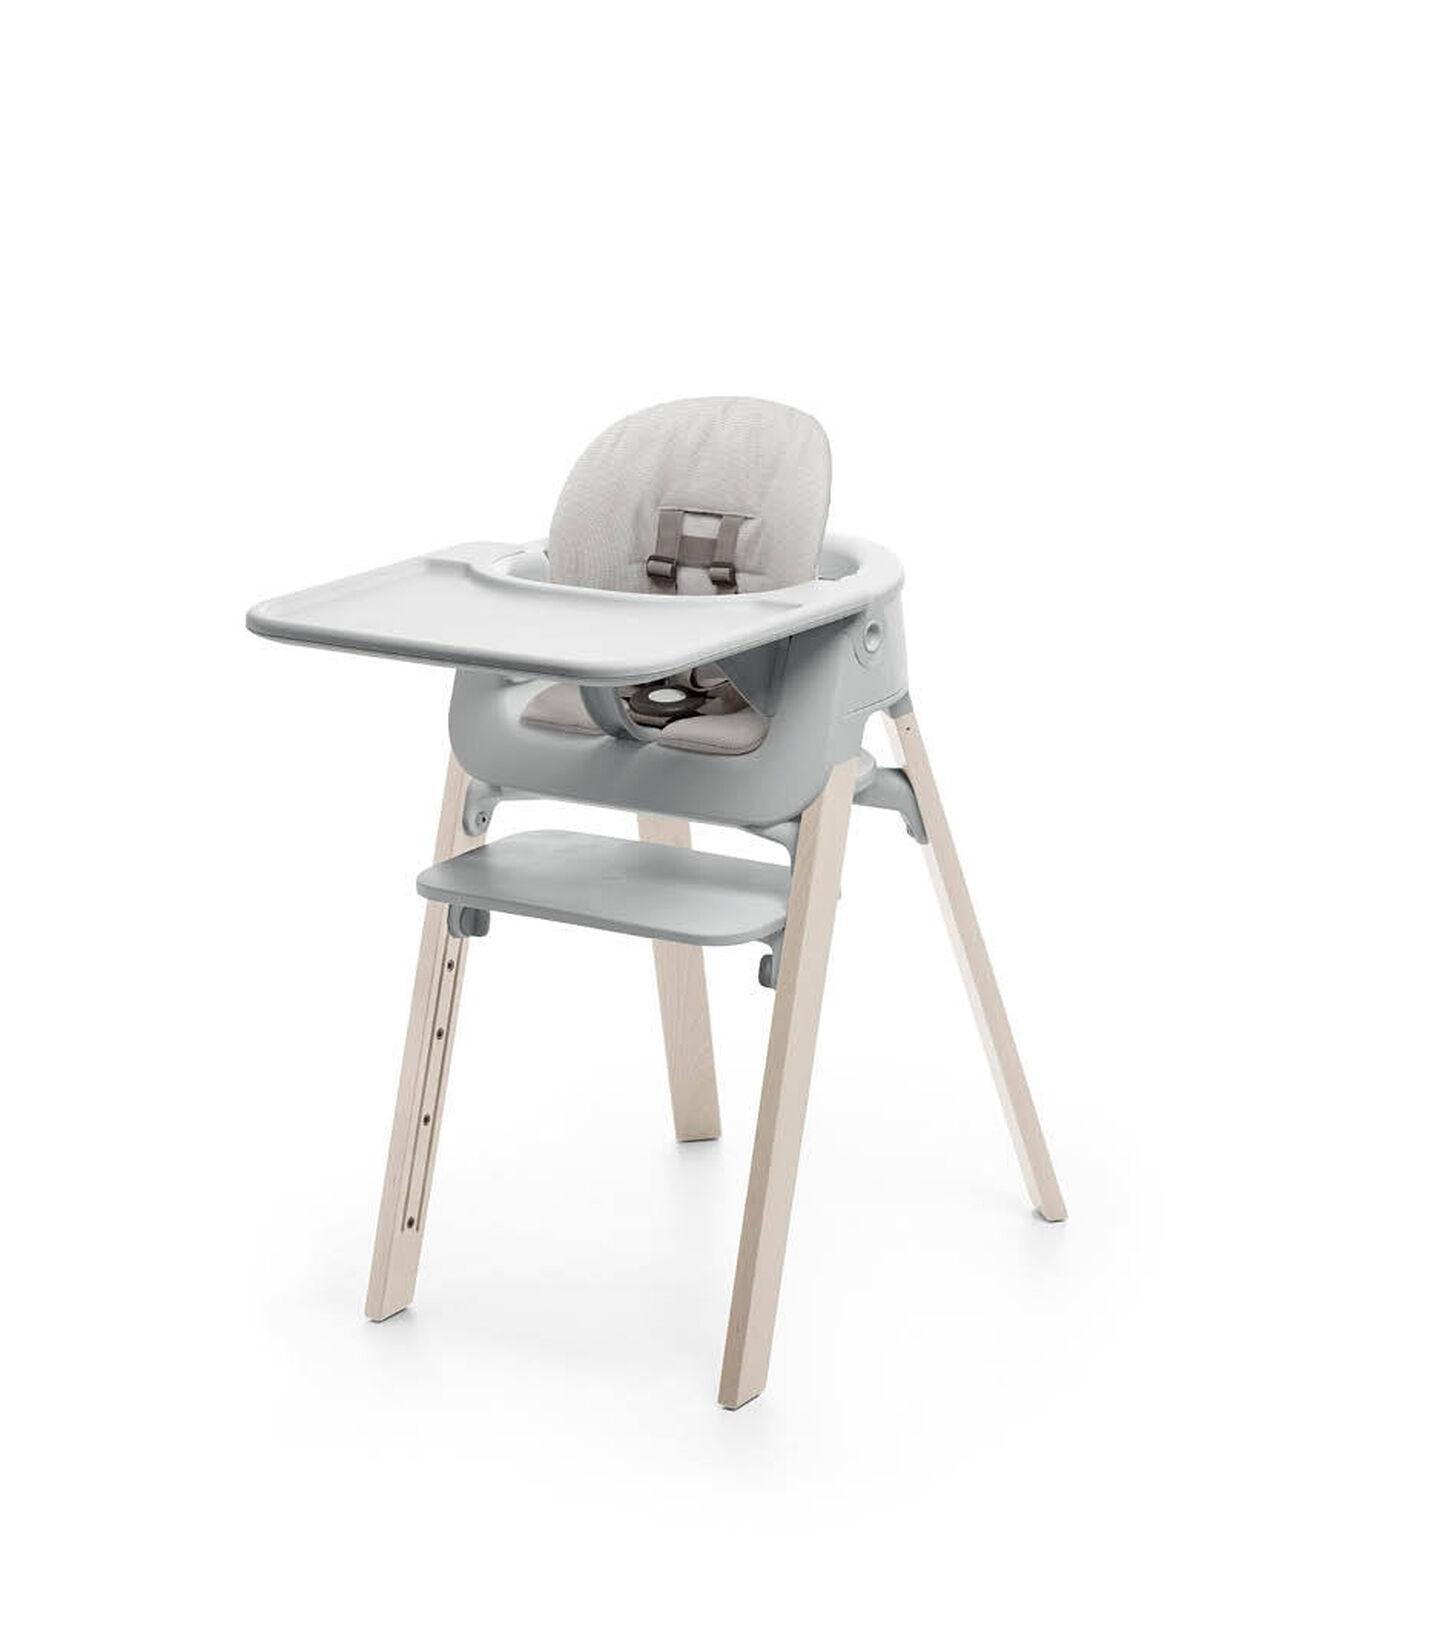 Stokke® Steps™ Whitewash with Accessories. Baby Set Light Grey. Baby Set Cushion Timeless Grey. Baby Set Tray Light Grey.